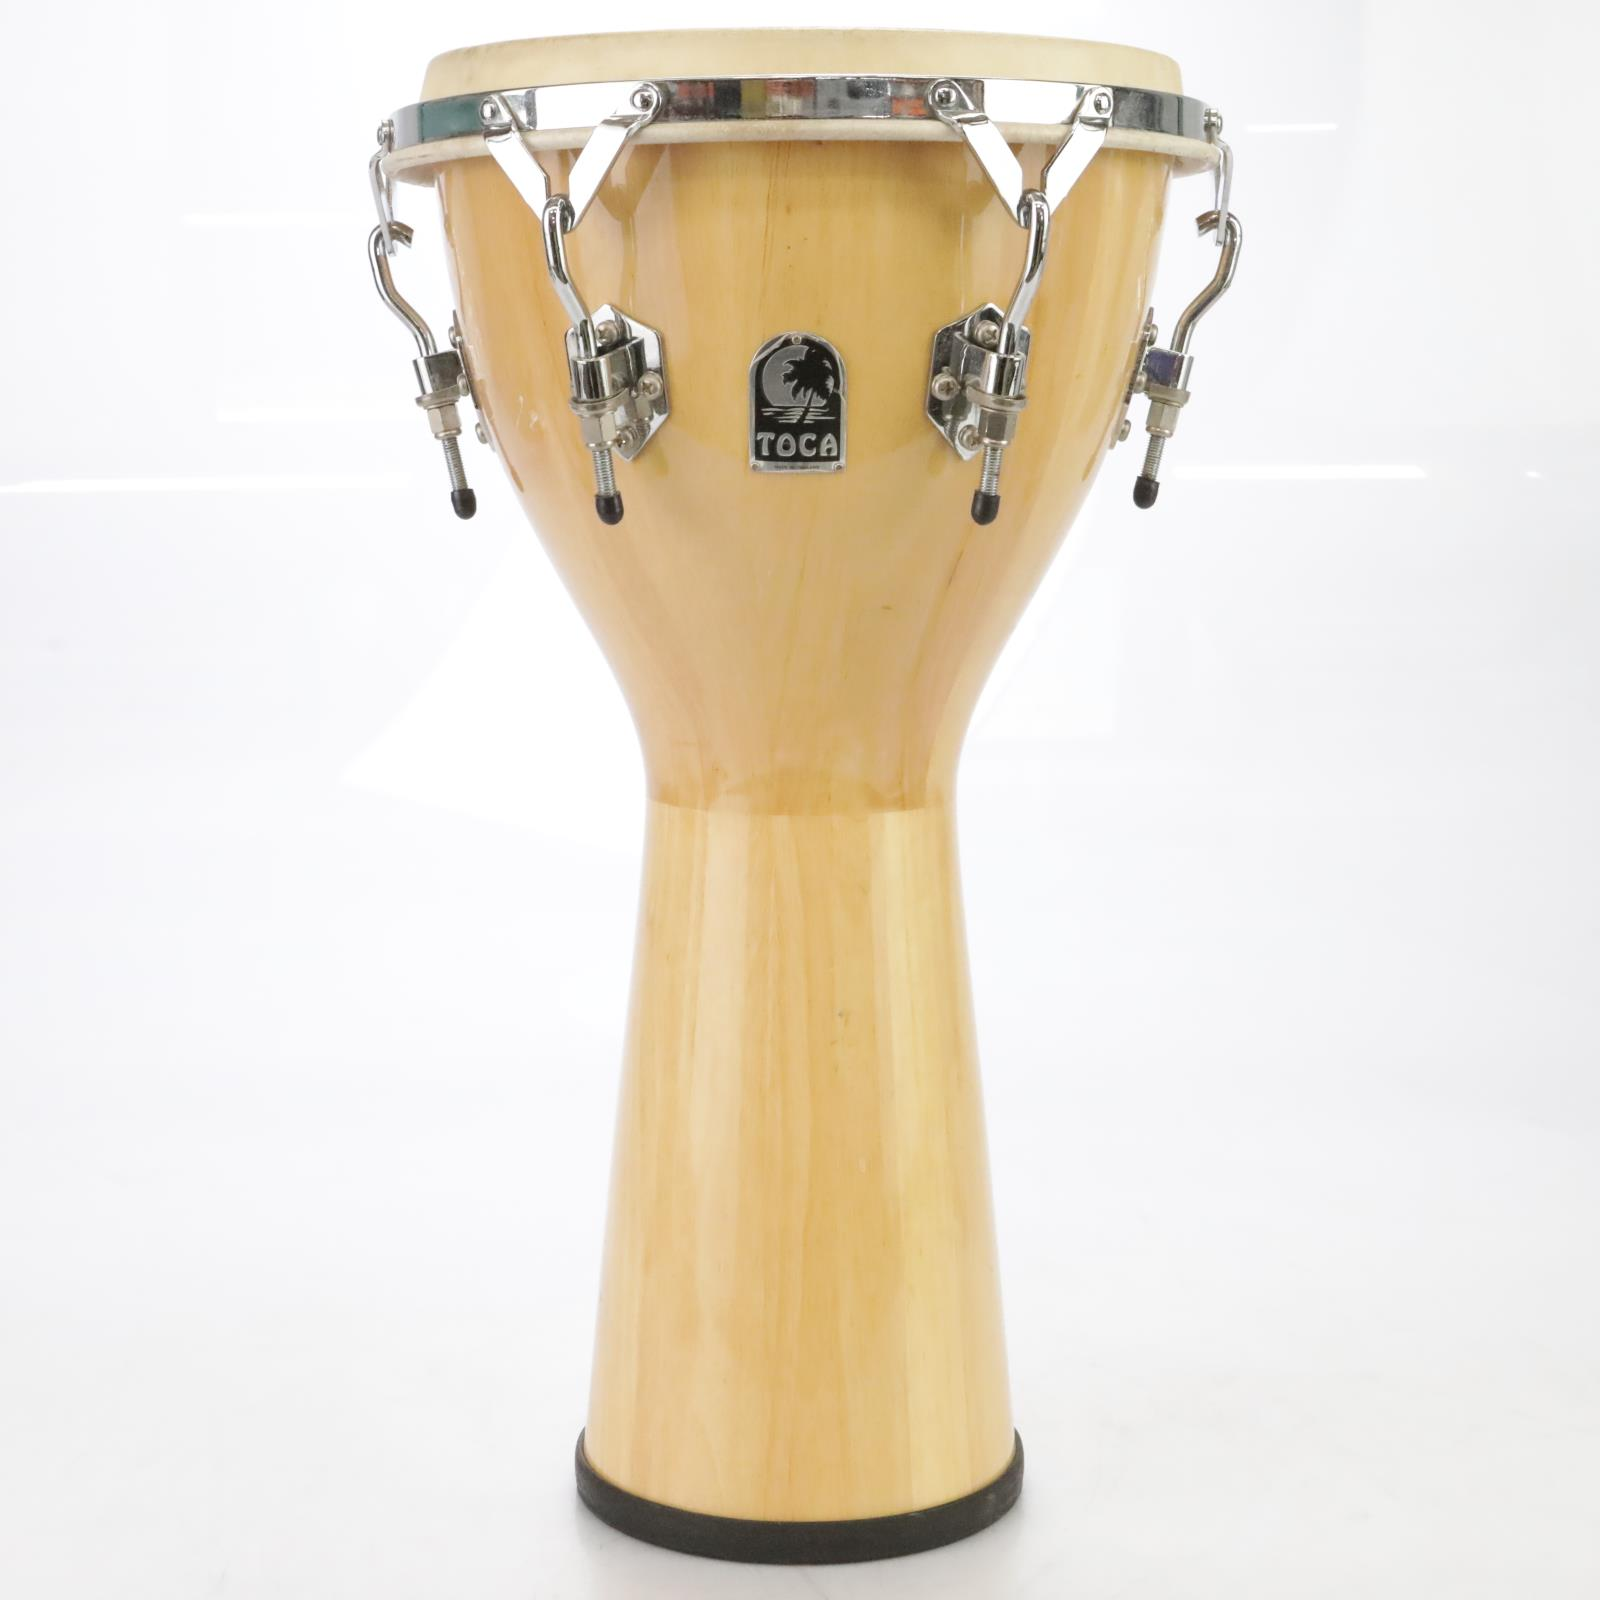 "Toca 14"" Djembe Percussion Drum #44358"